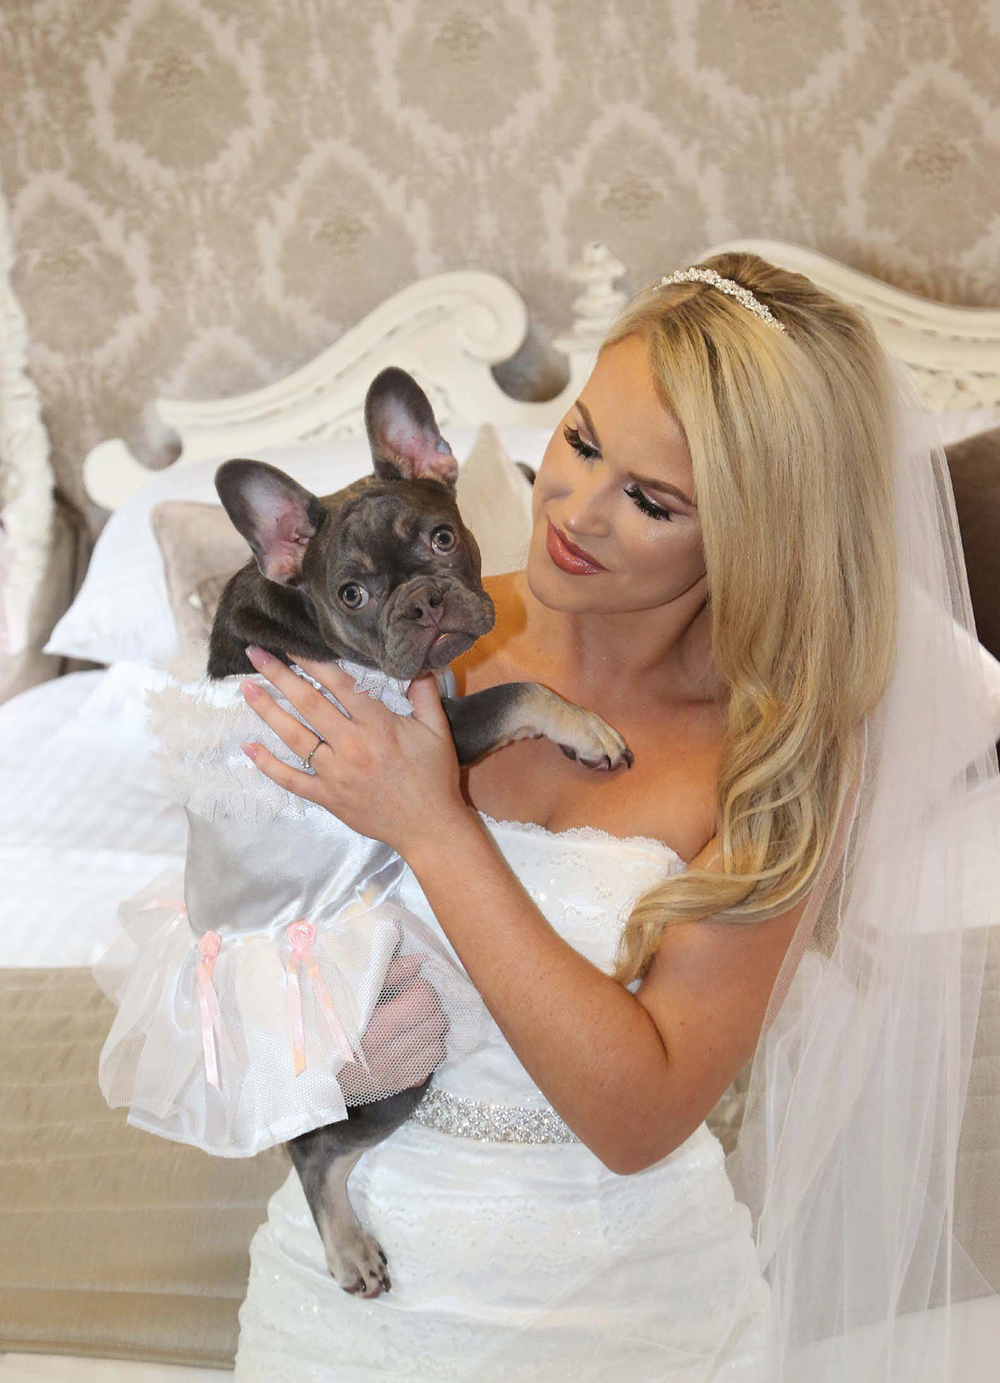 Ryan Mimiec Photography - Chatelherault wedding - Nicky McDonald getting ready